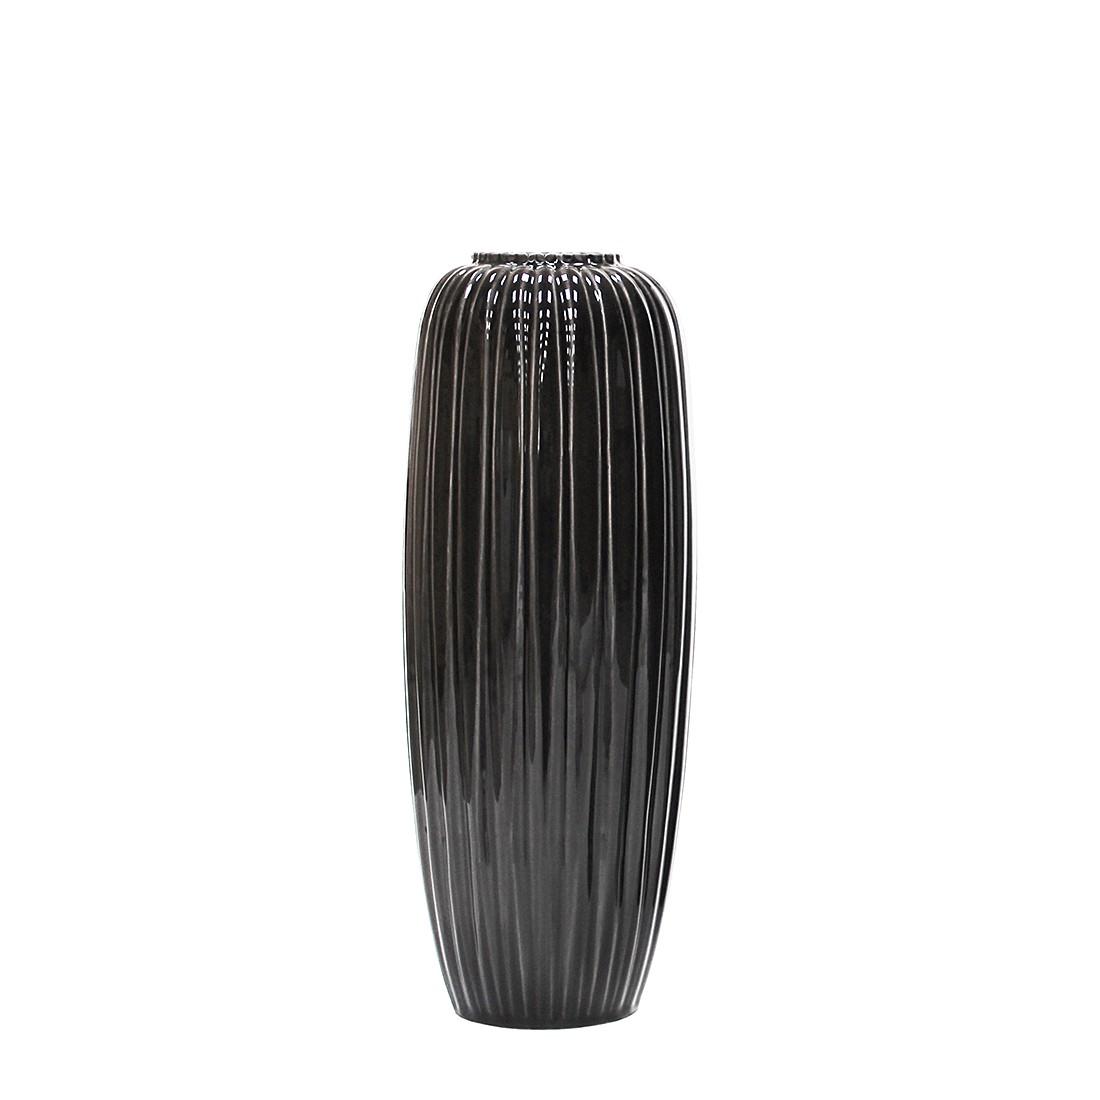 Vase Retro II – Keramik, Canett günstig kaufen